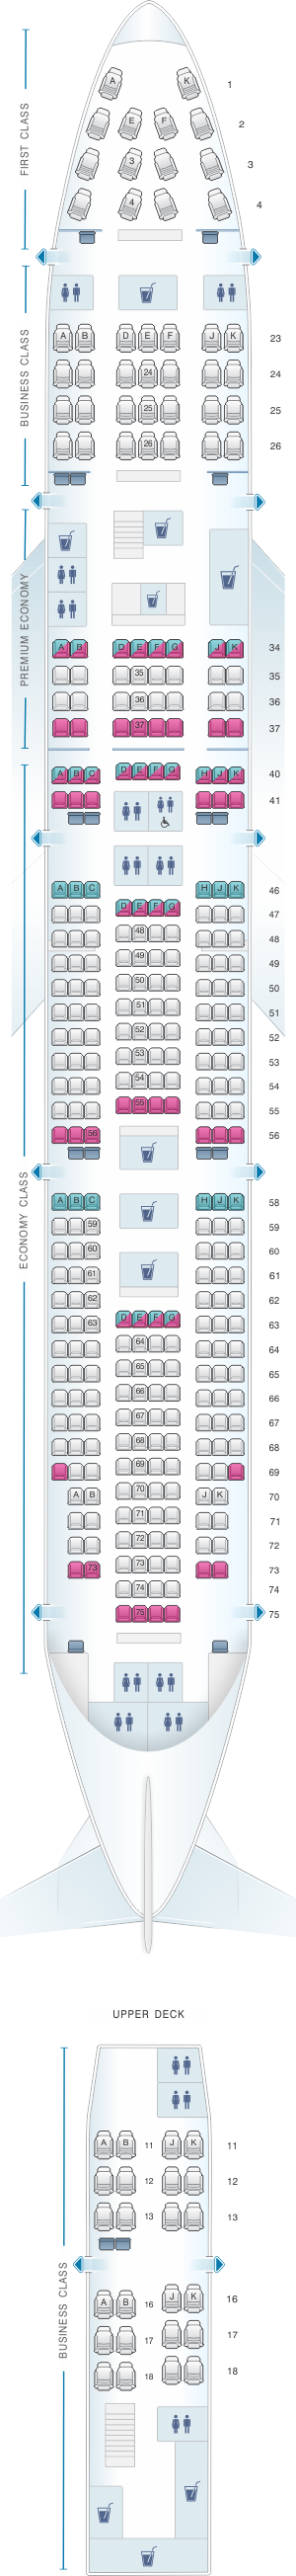 Seat map for Qantas Airways Boeing B747 400 353PAX